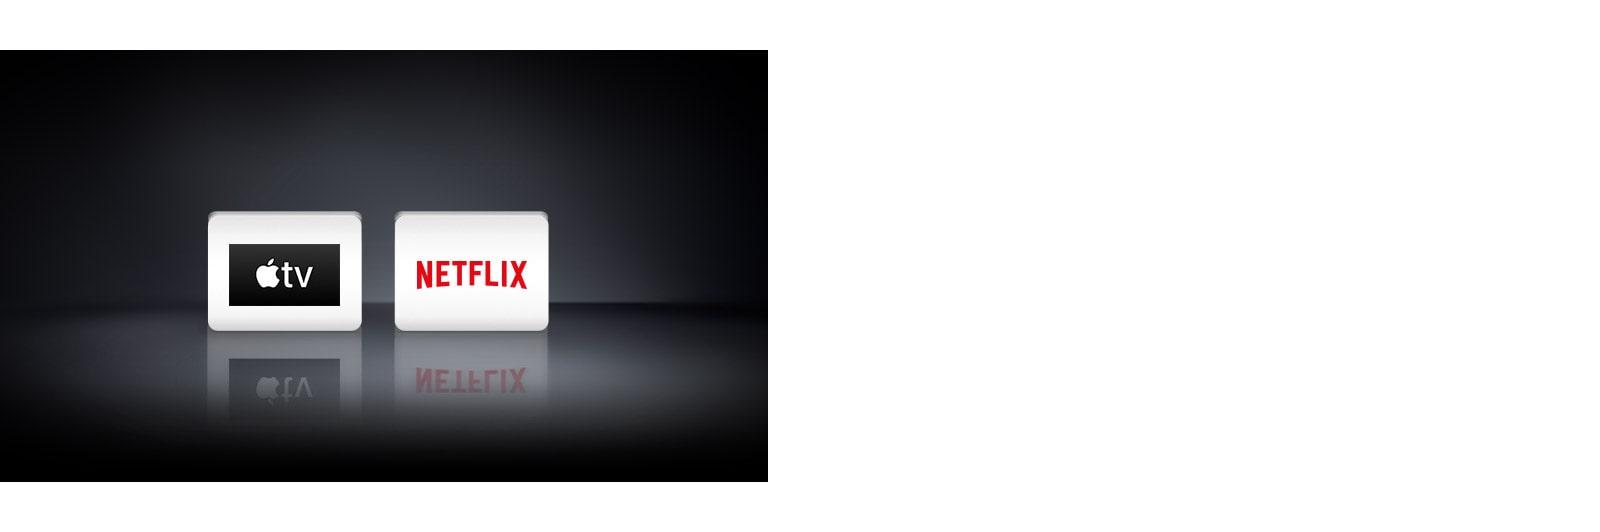 Četiri logotipa: aplikacija Apple TV, Netflix